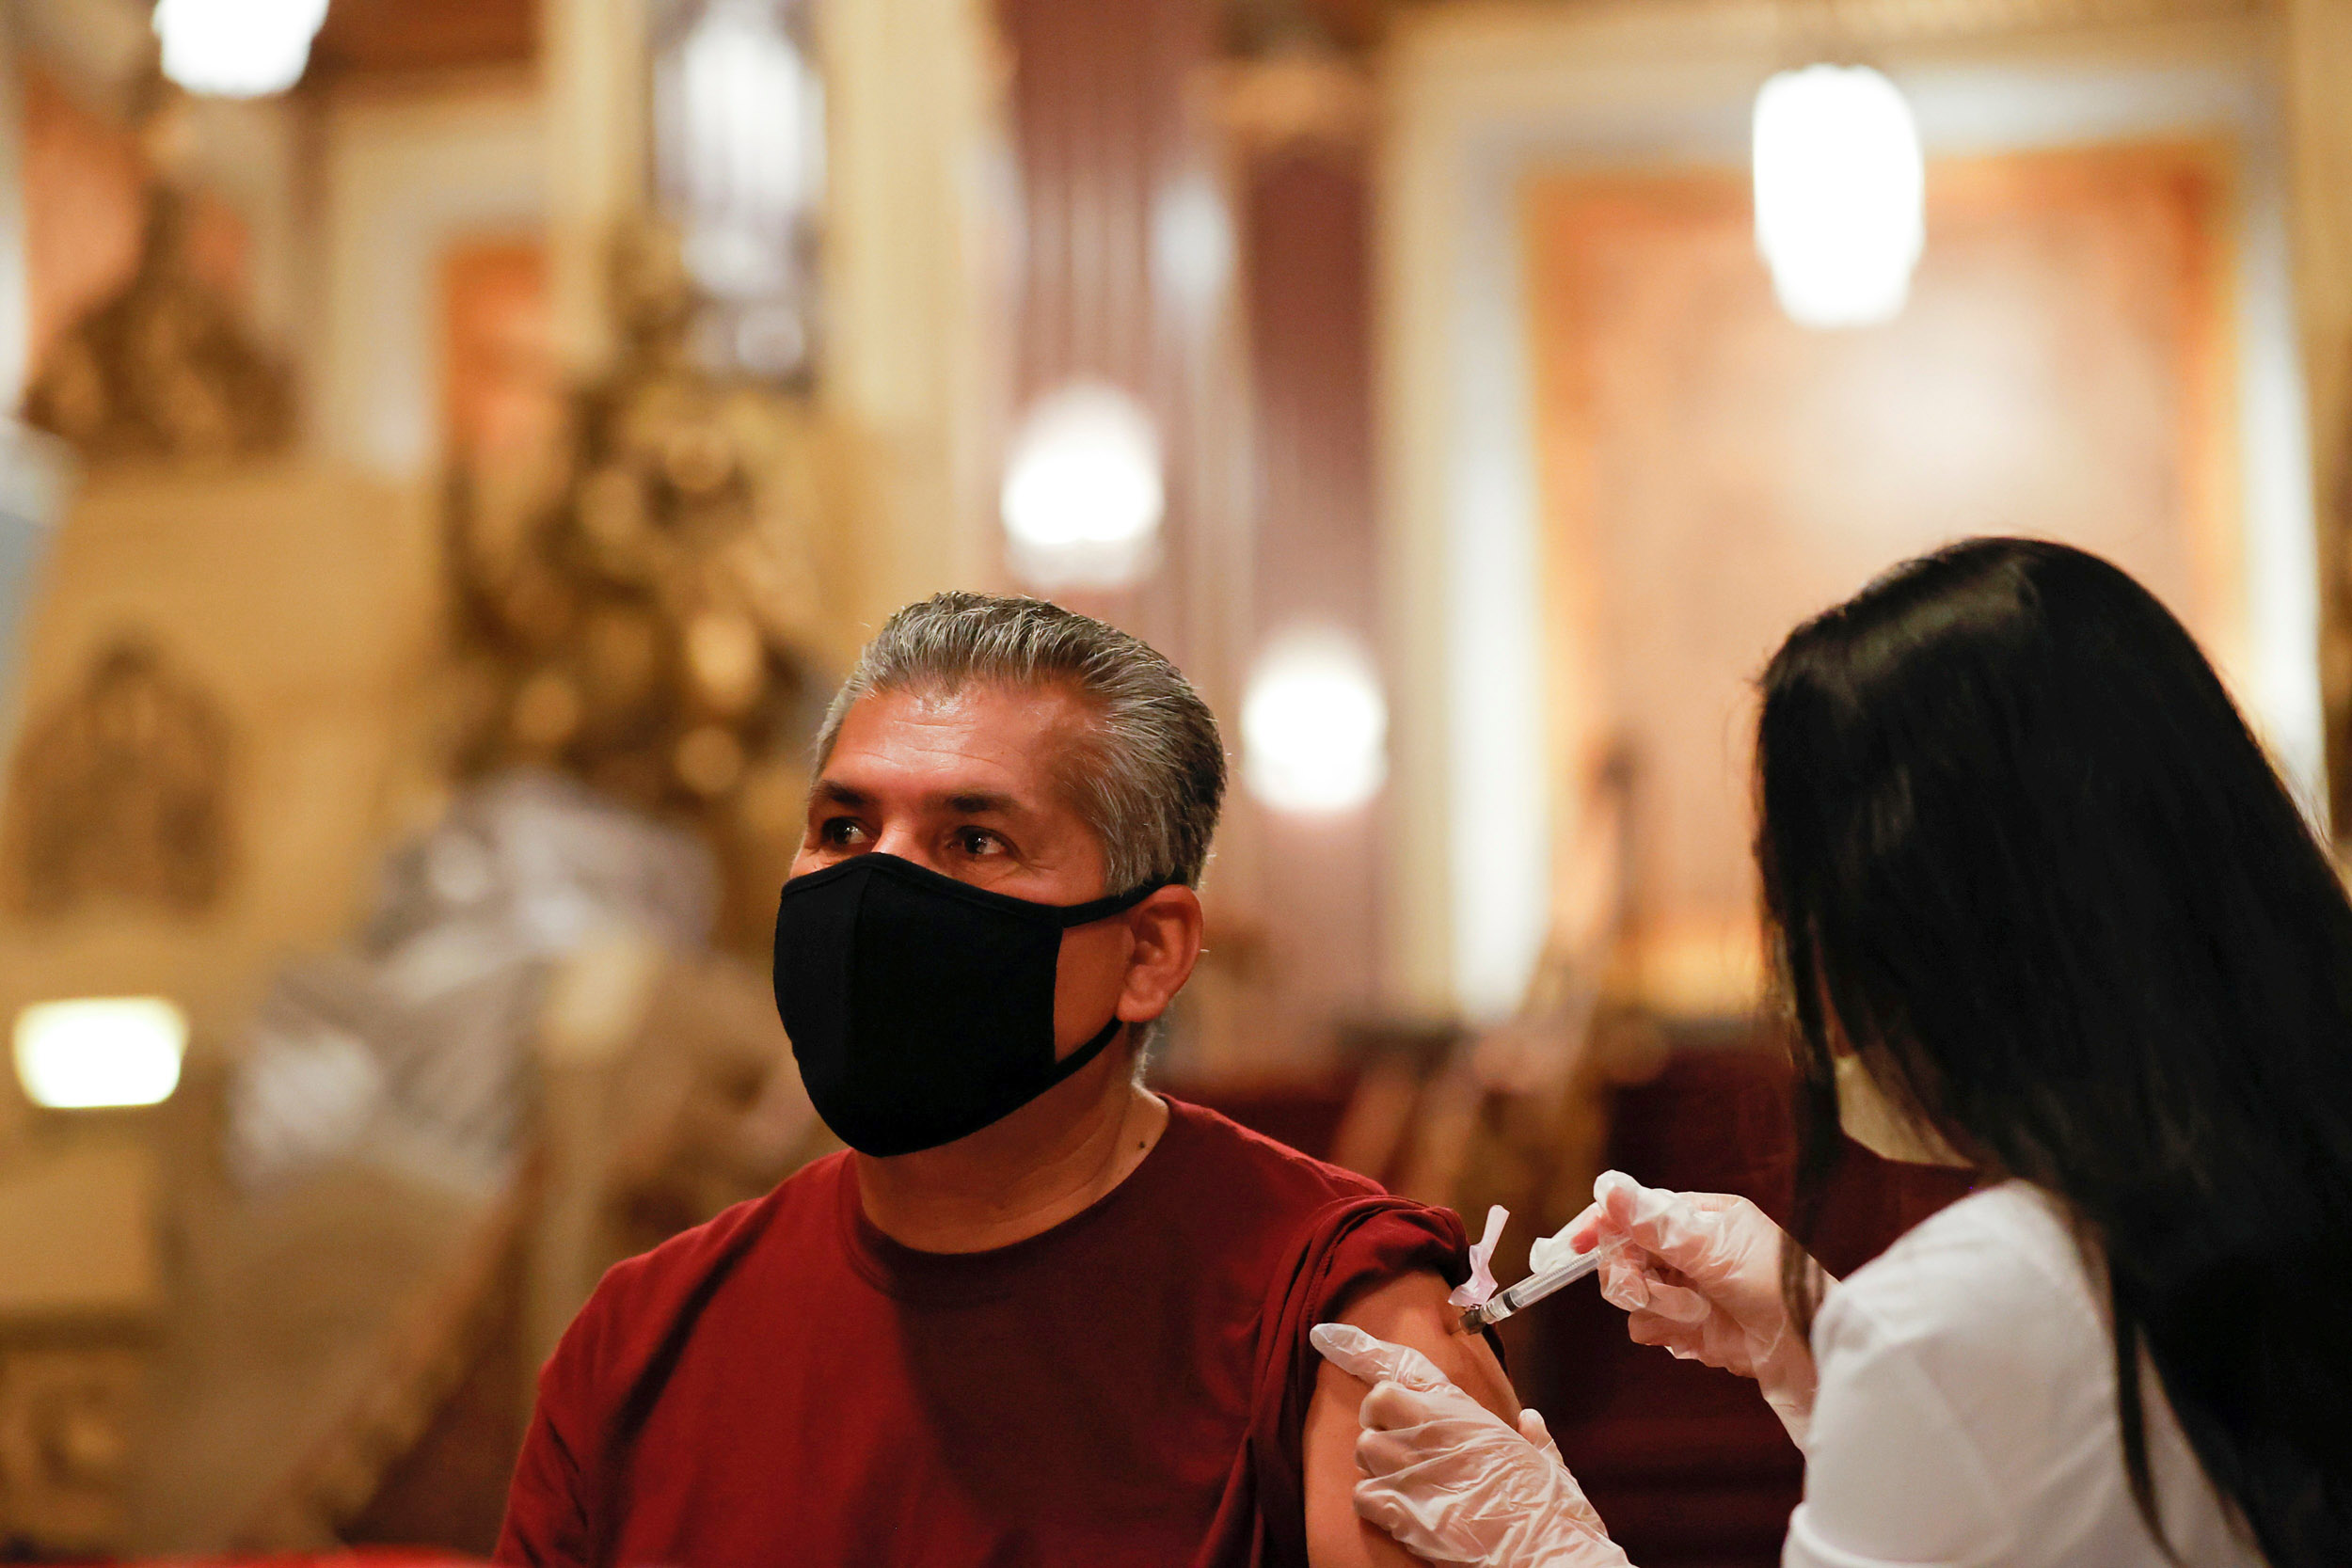 U.S. passes 35 million Covid cases as California tops 4 million